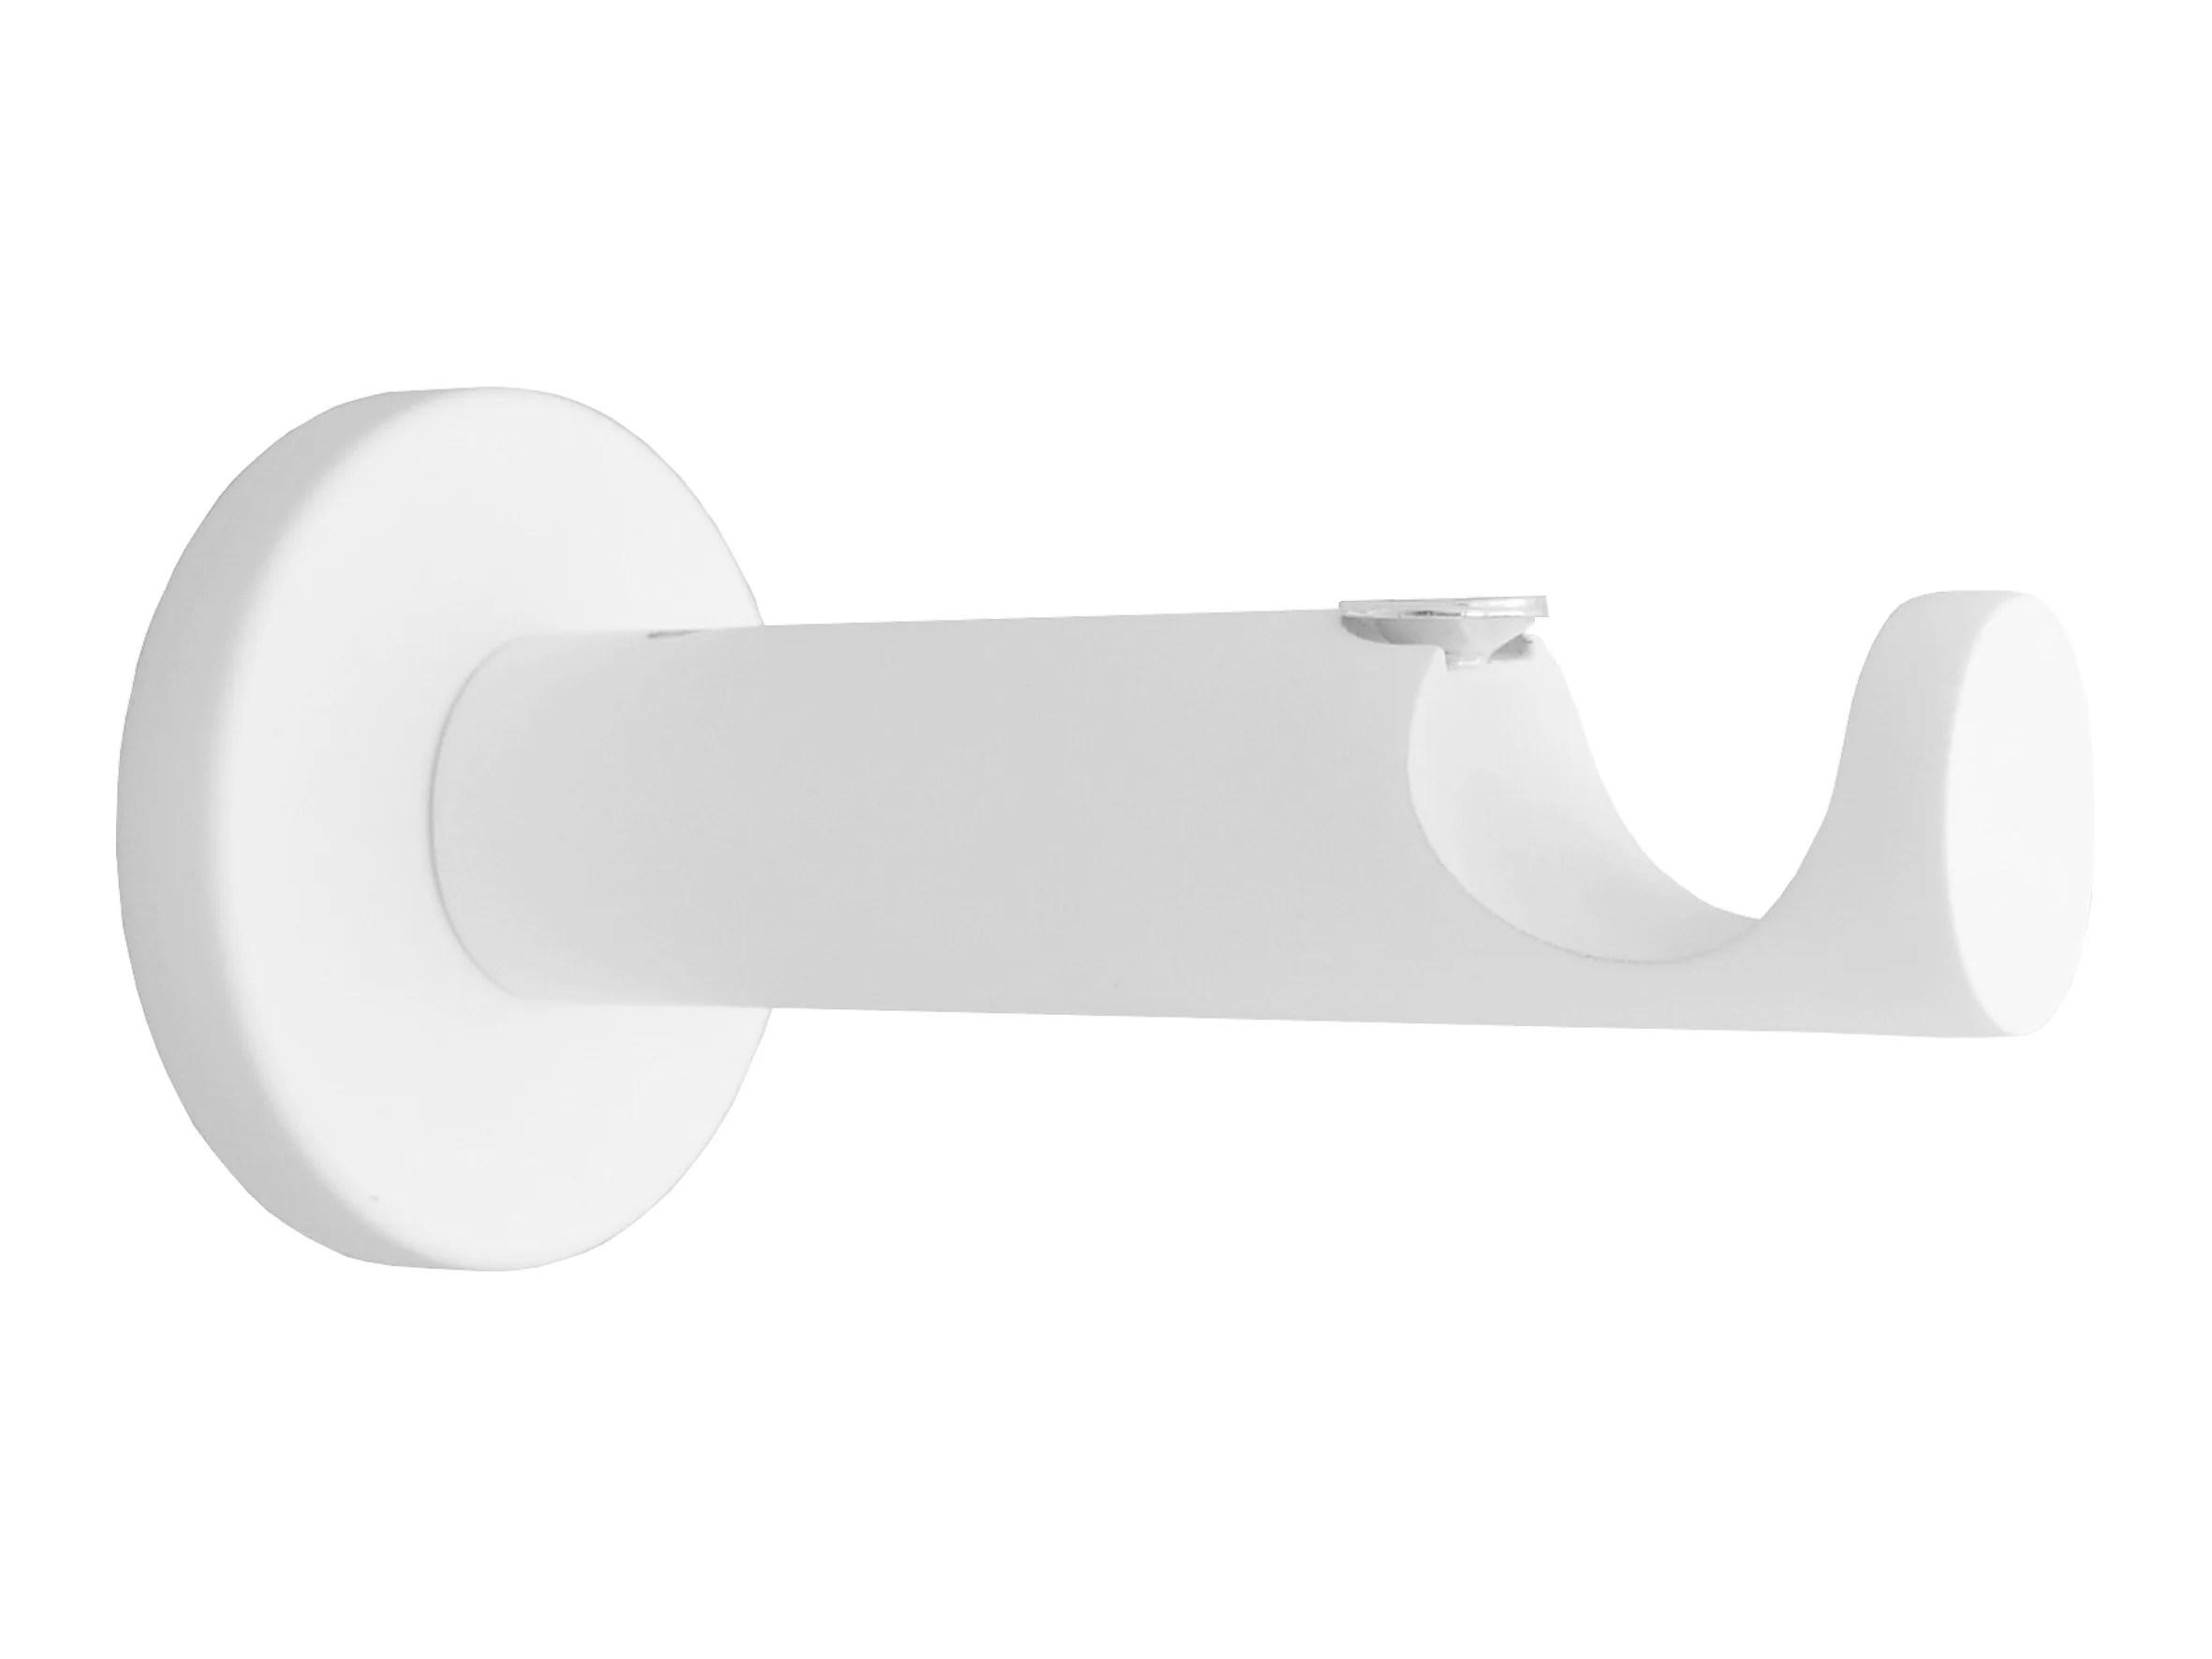 lot de 2 supports tringle a rideau design 20 mm blanc mat inspire